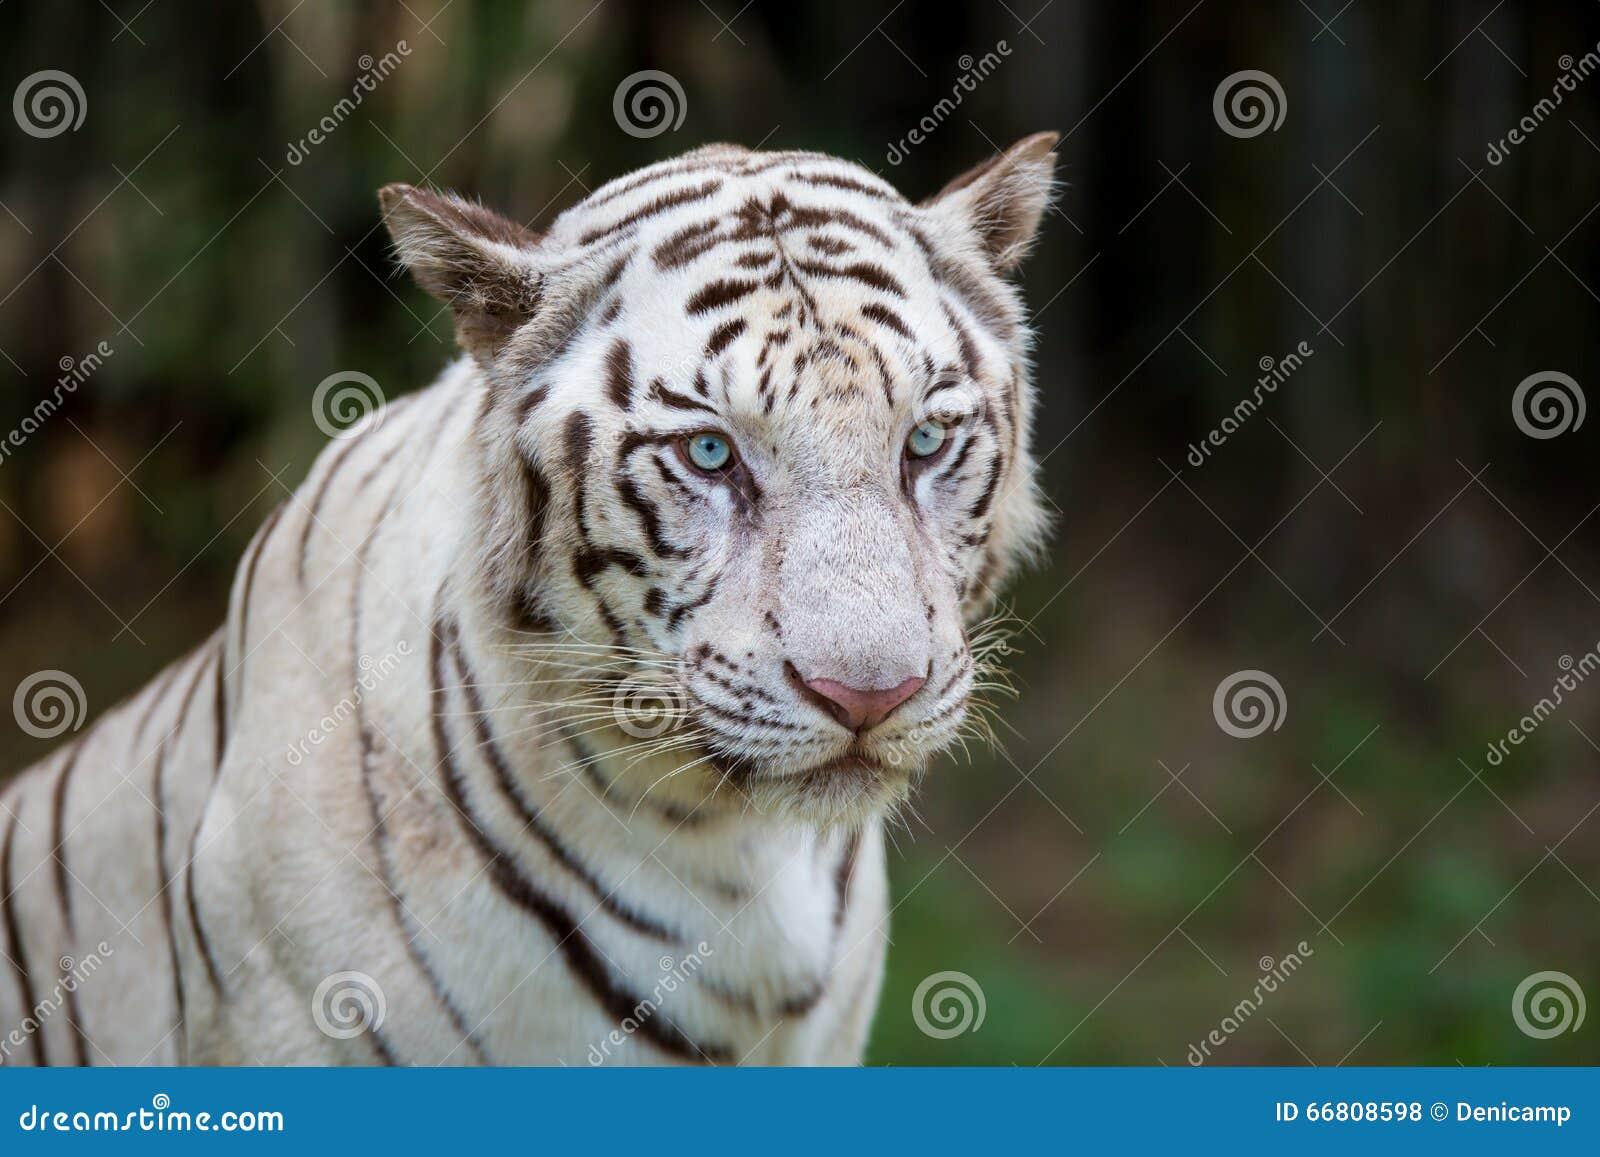 Rare White Tiger Roaming Wild  Stock Photo - Image of